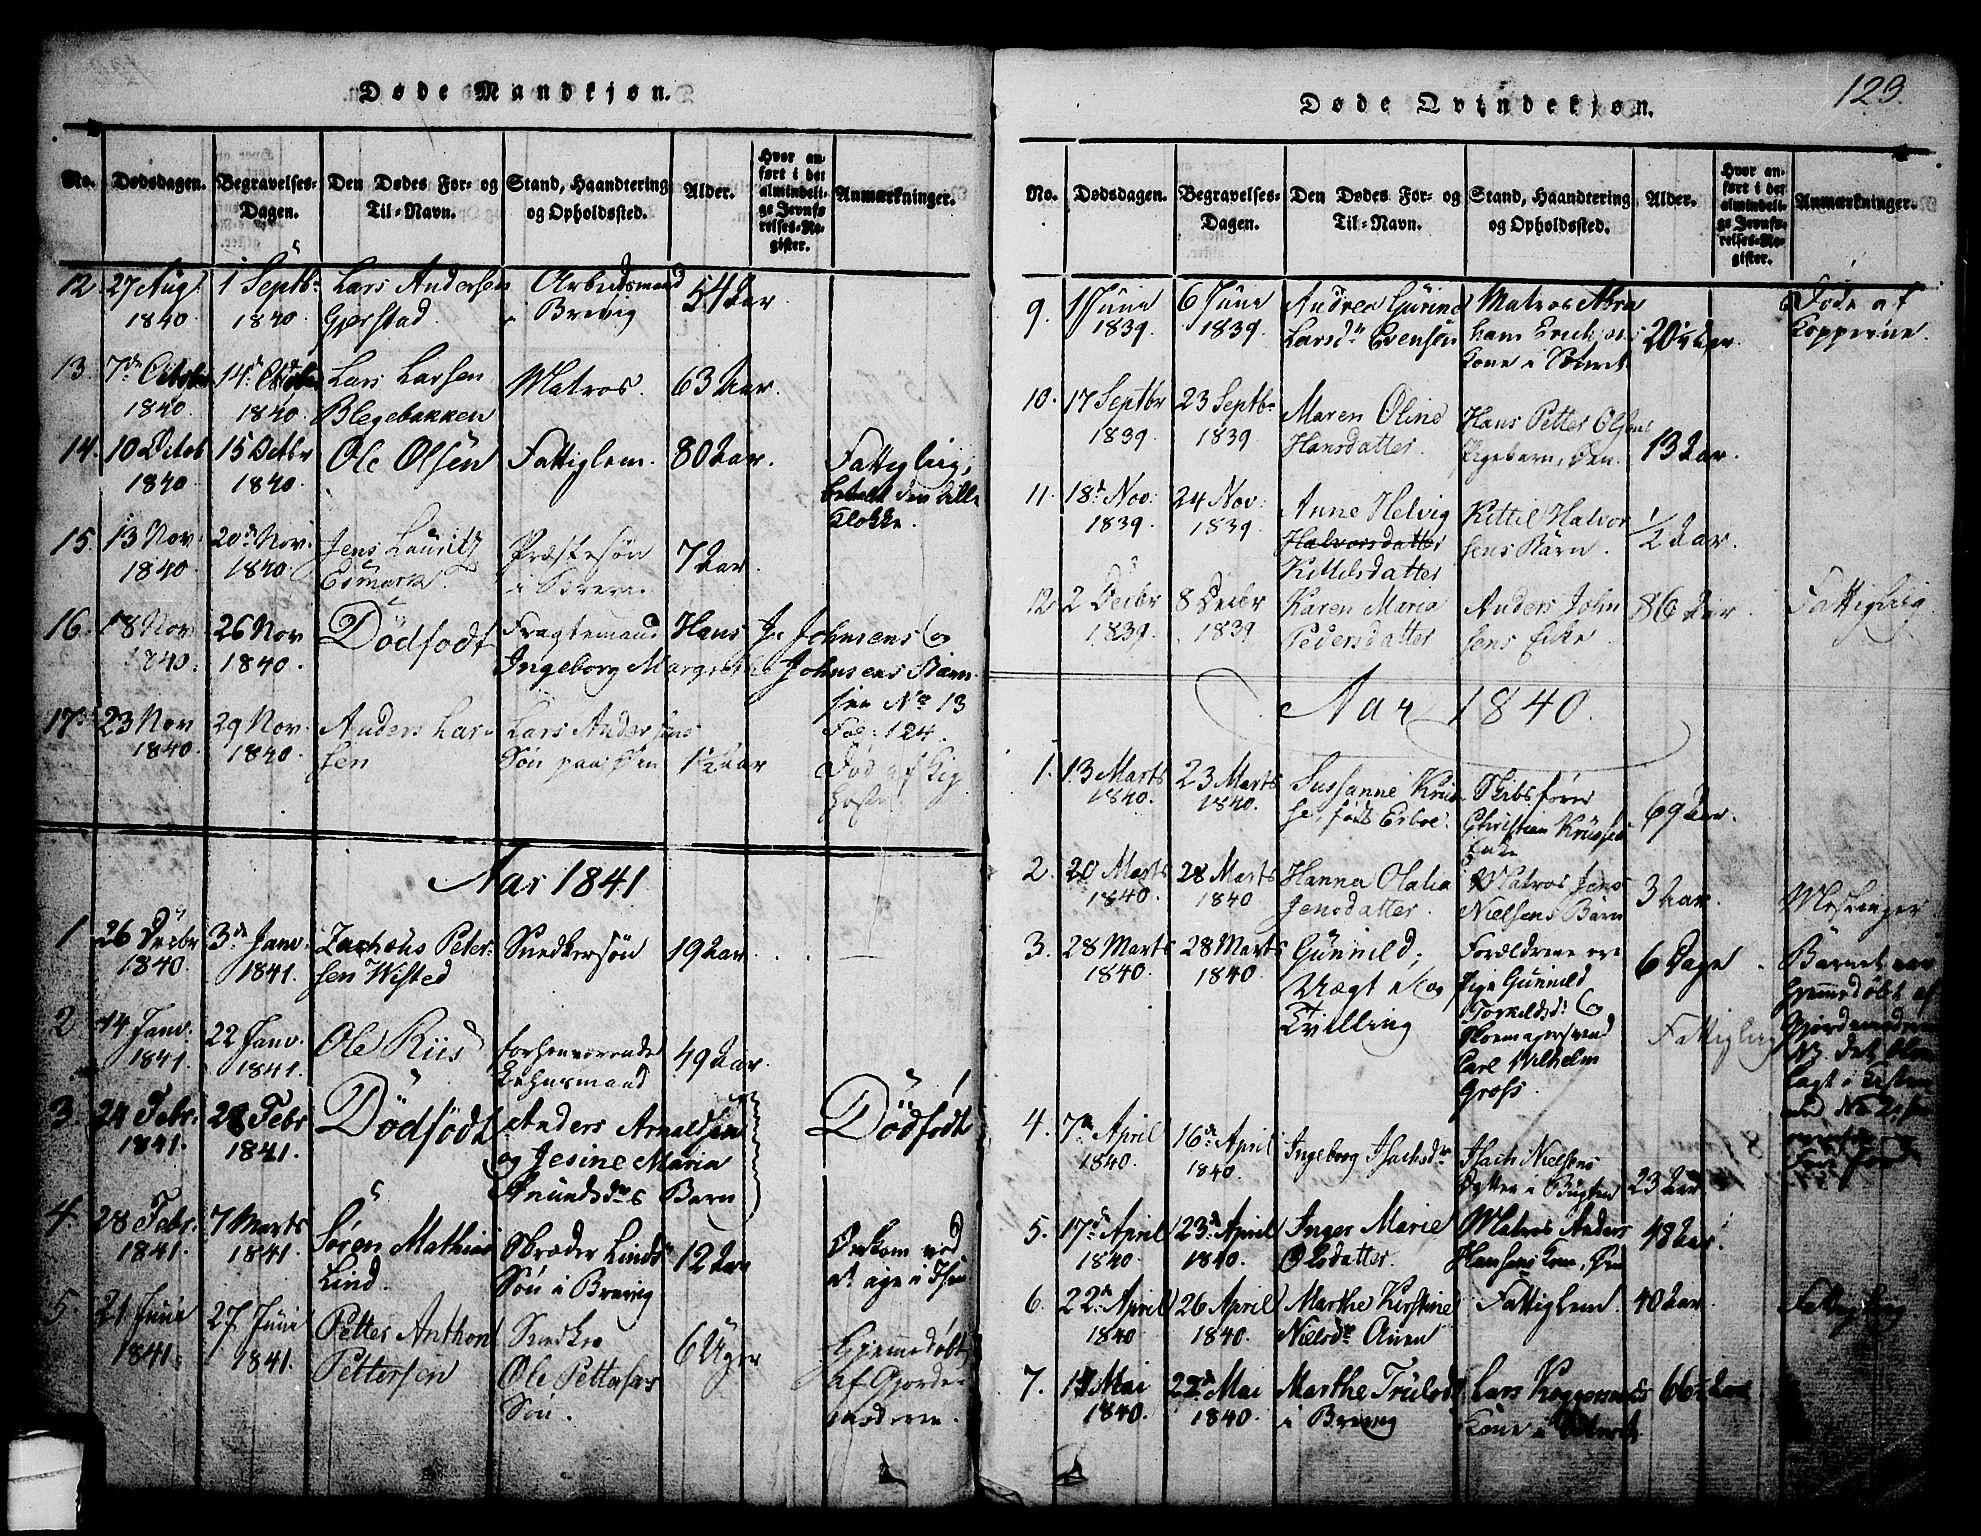 SAKO, Brevik kirkebøker, G/Ga/L0001: Klokkerbok nr. 1, 1814-1845, s. 123